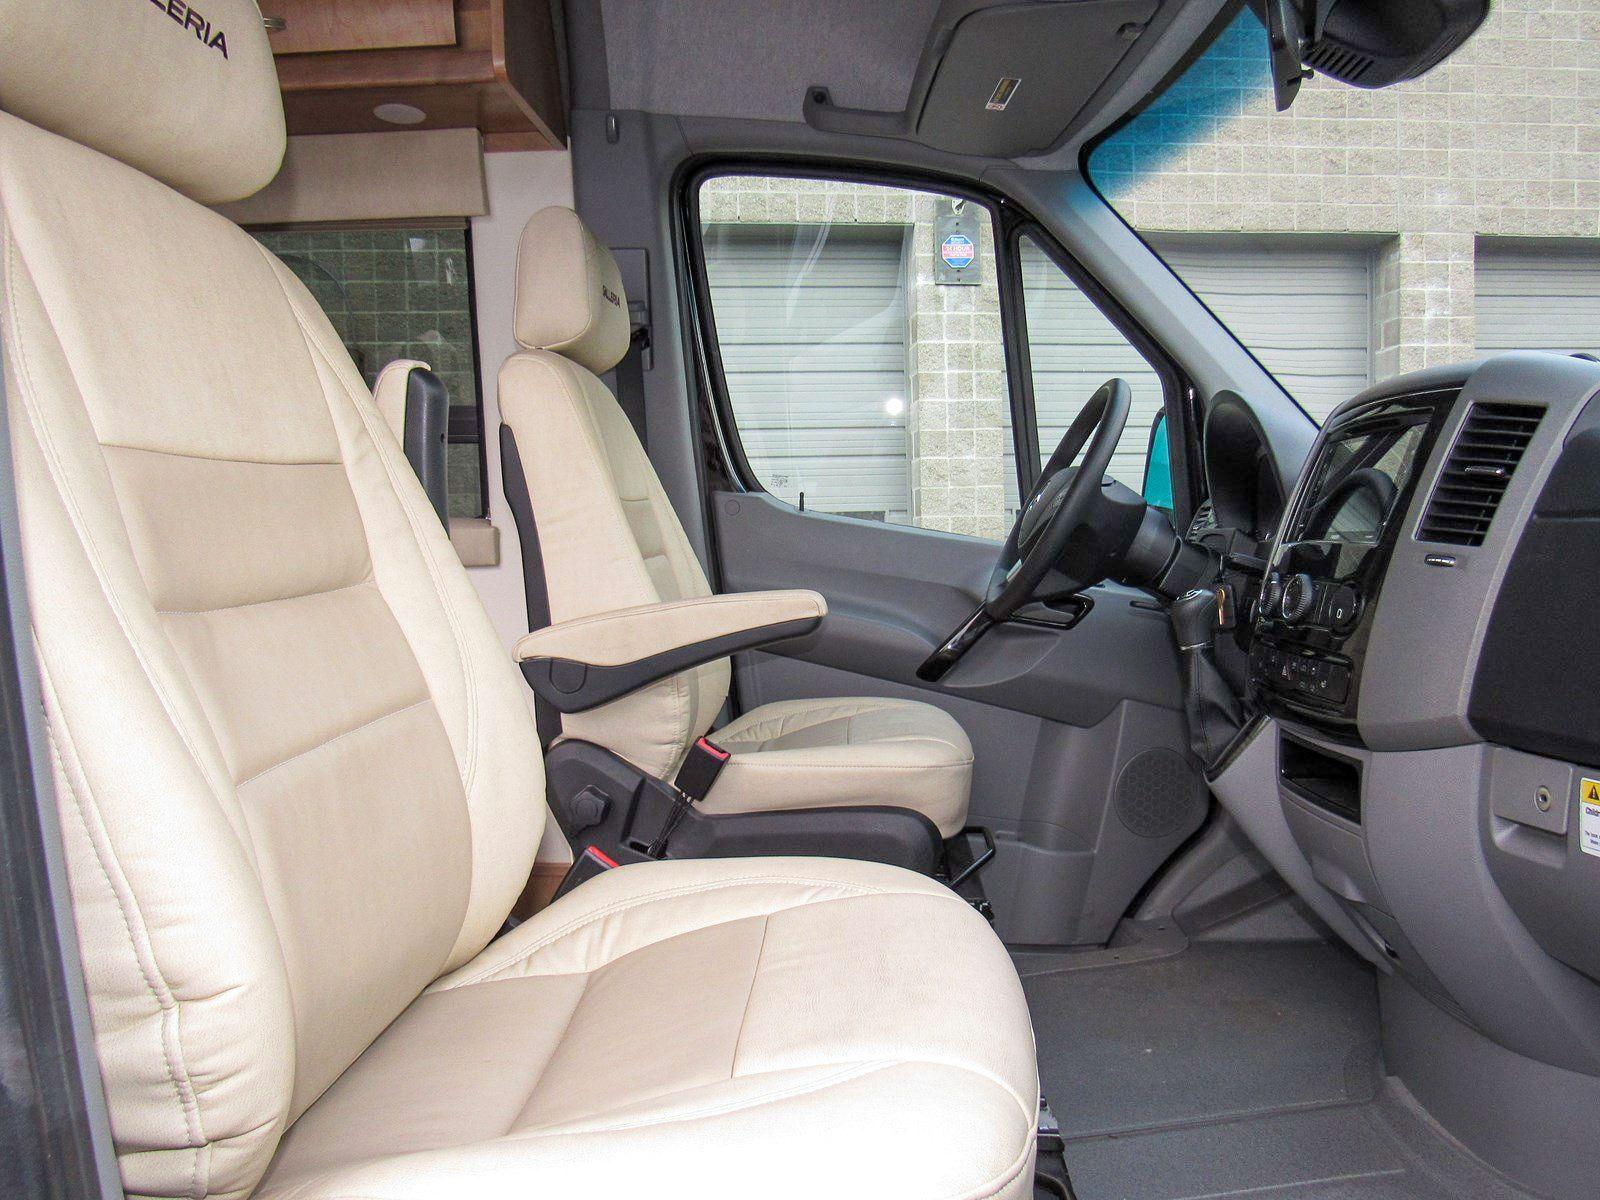 2019 Coachmen Galleria 24q 2645 Used Rvs For Sale Leisure